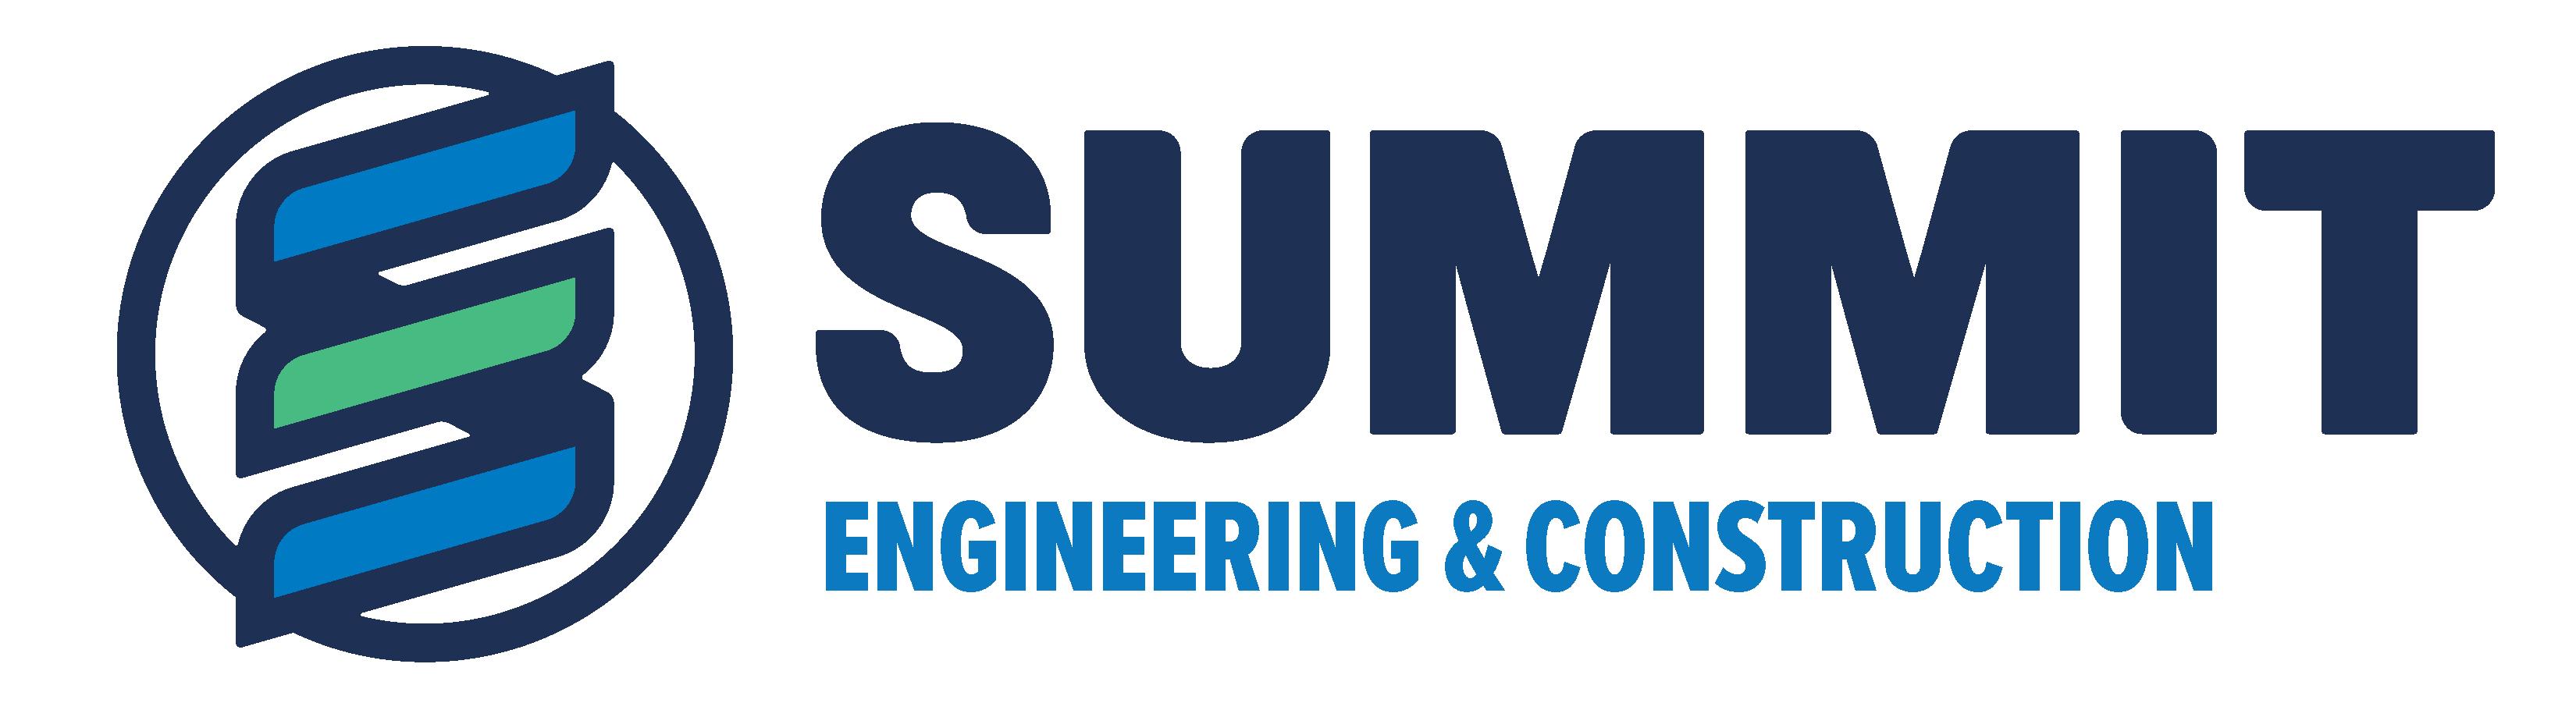 Summit Engineering & Construction